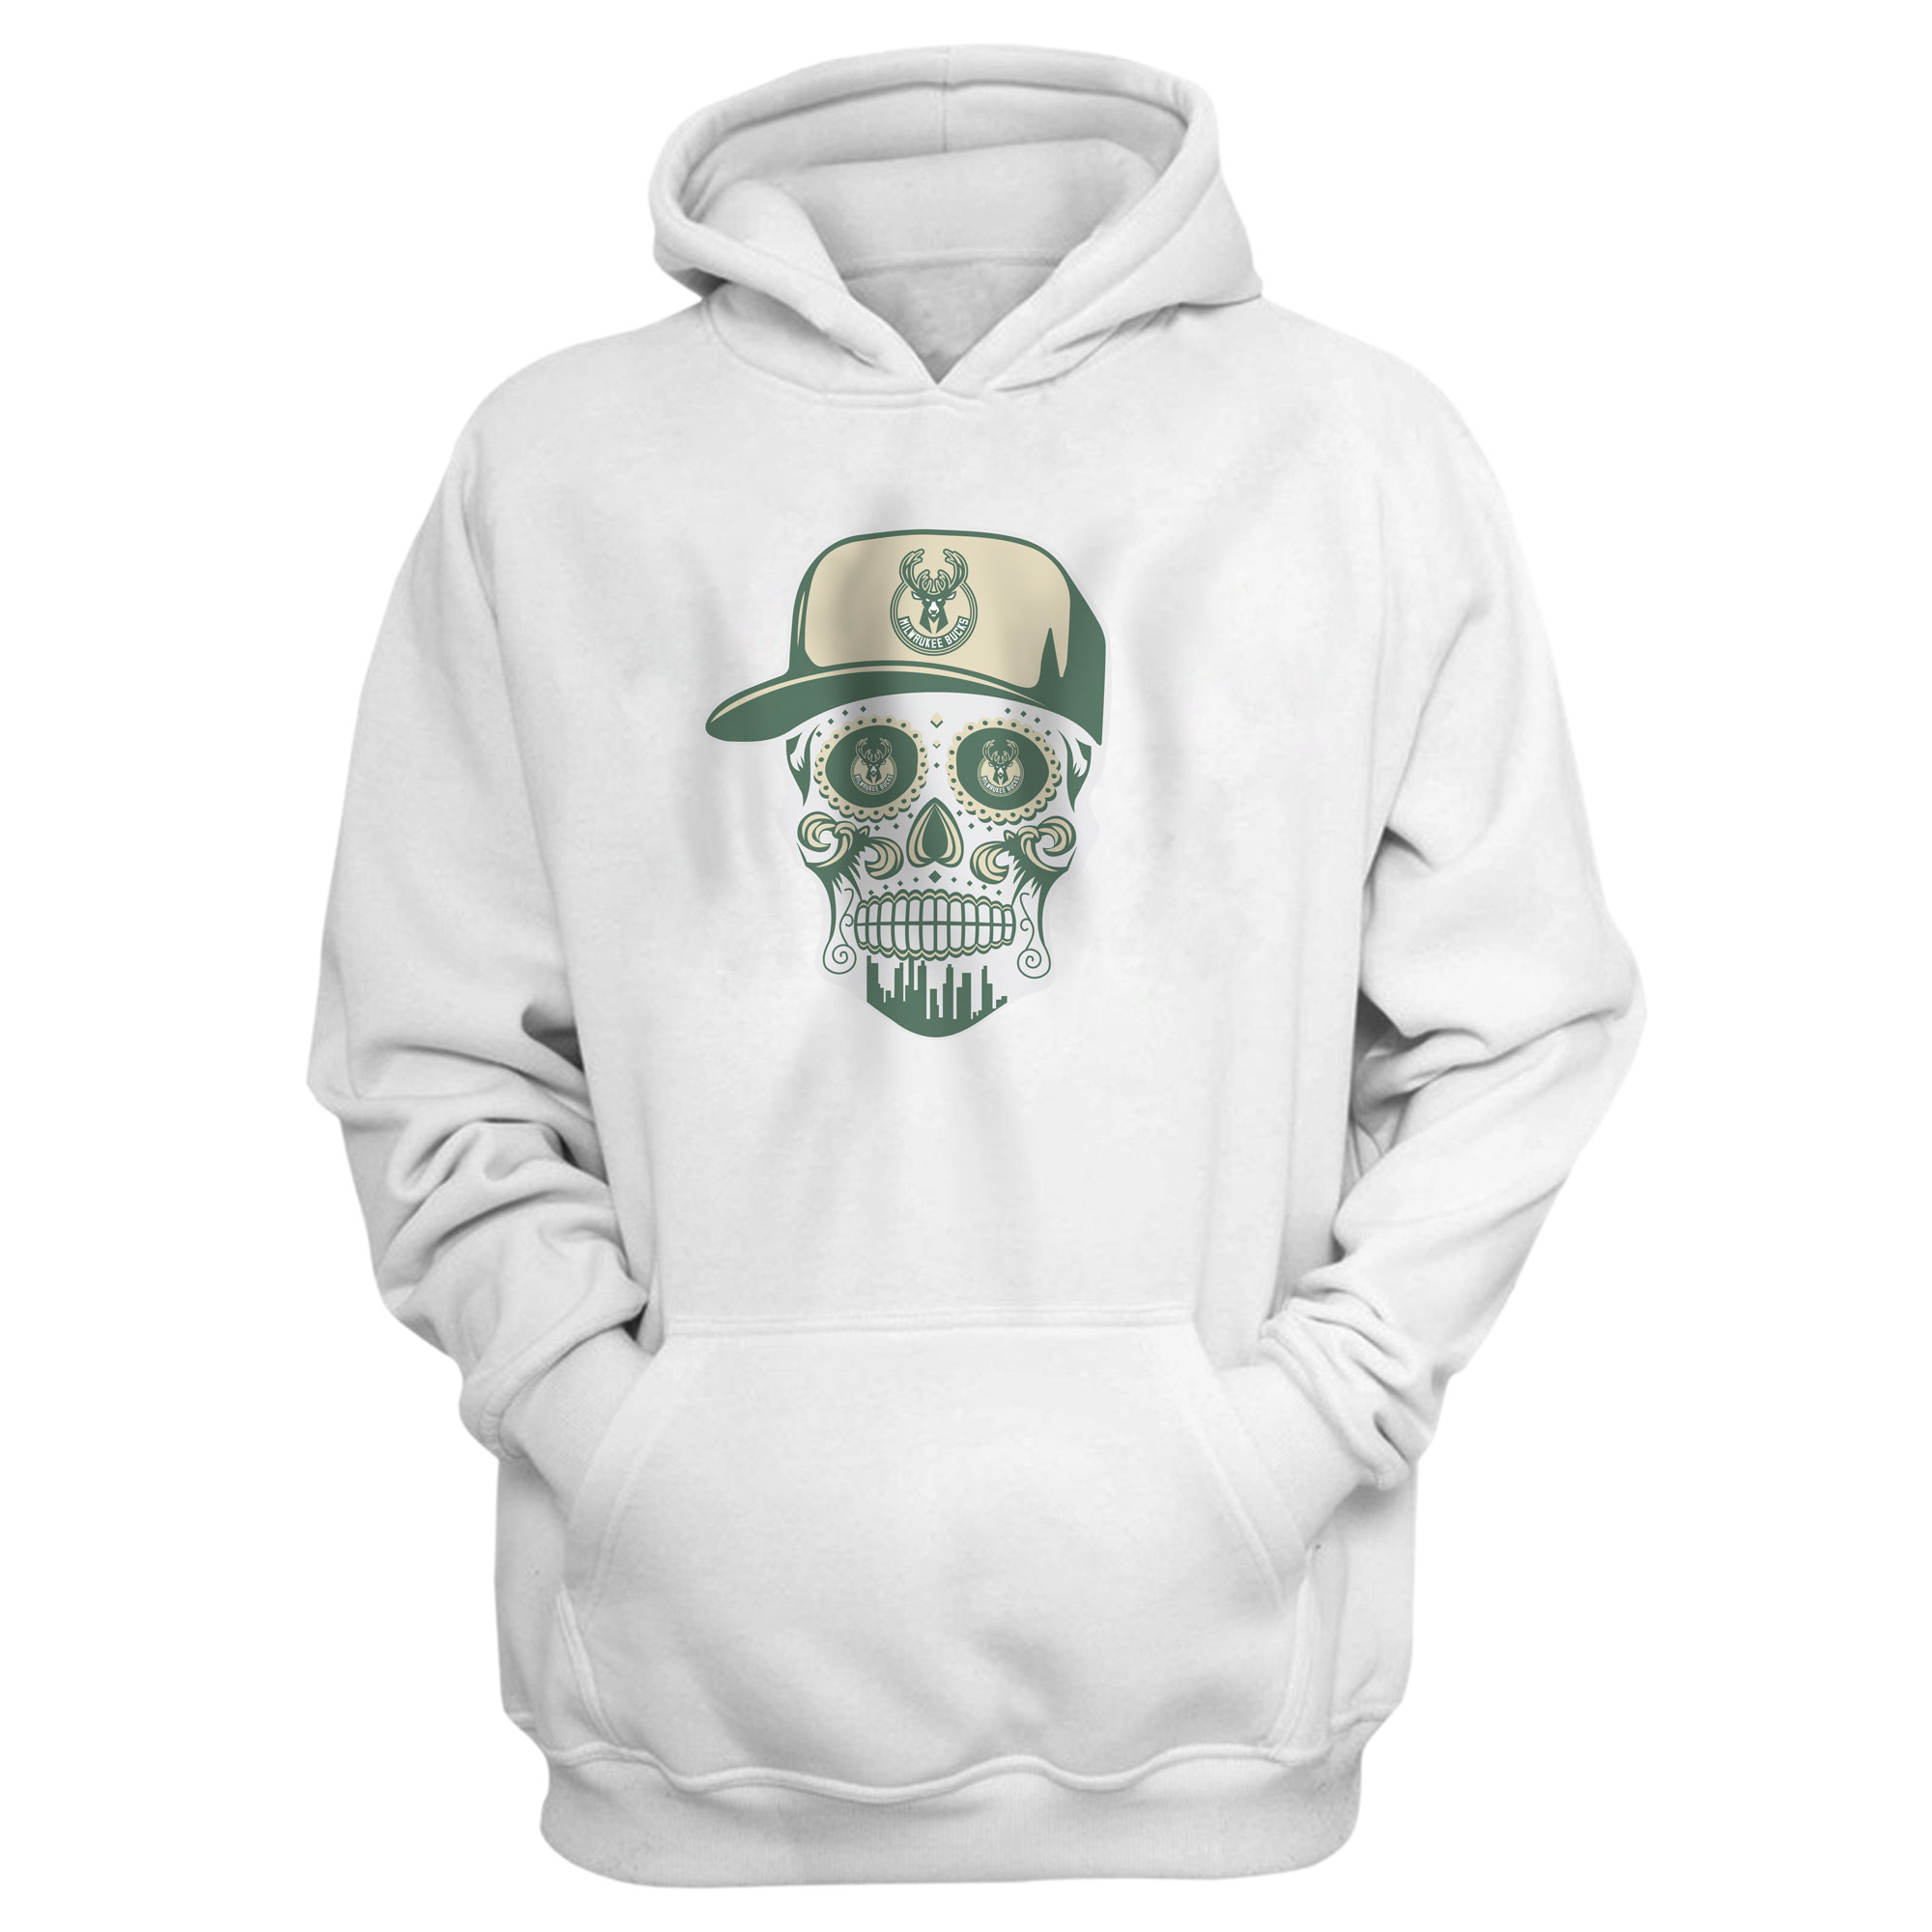 Bucks Skull  Hoodie (HD-WHT-NP-446-BUCKS-SKULL)